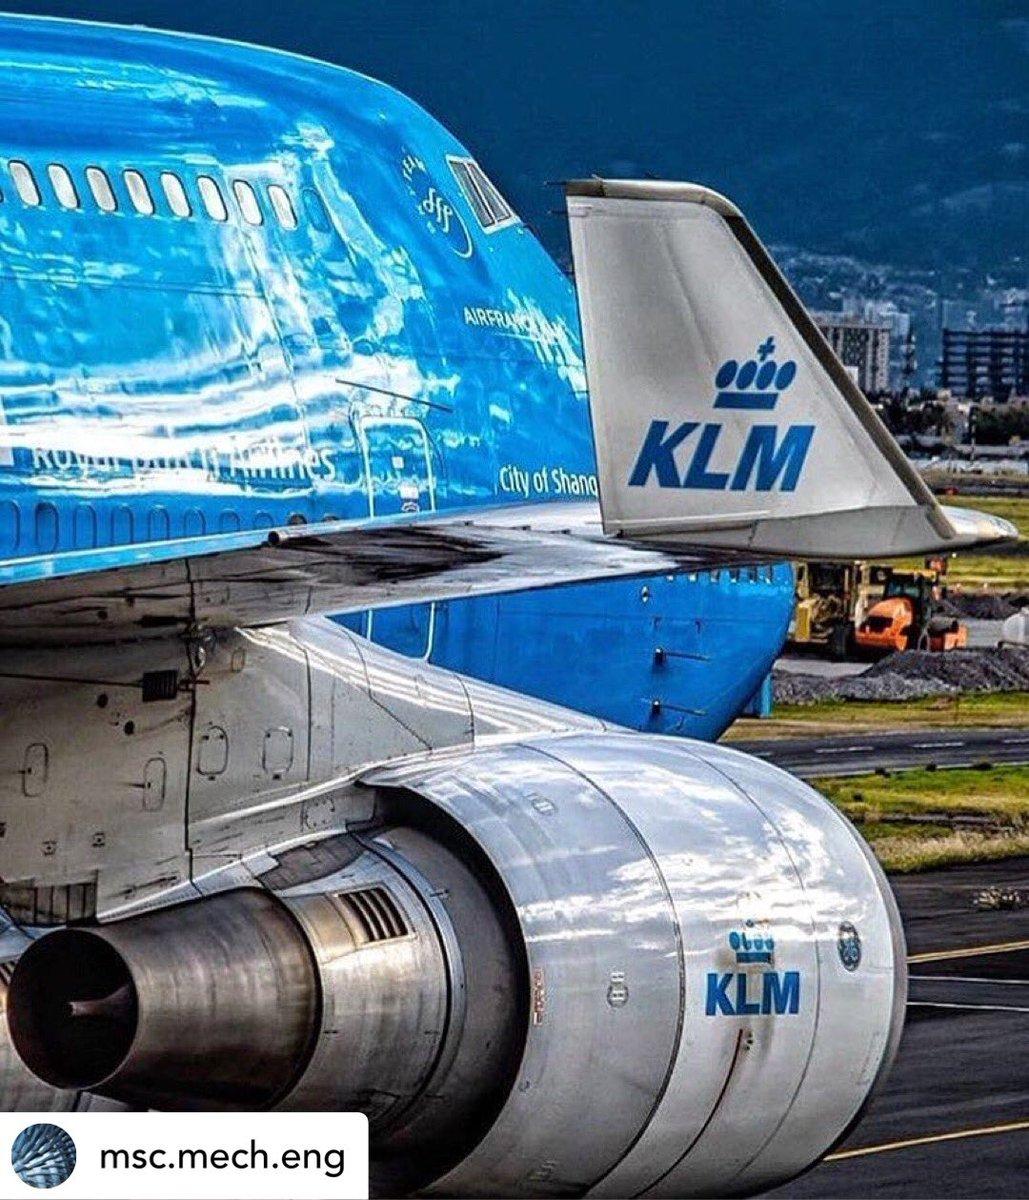 A Dutch Queen by @sarteaspotter  #aviationlover #aviator #av1ati0n #aviationdaily #avgeek #avgeeks #spotting #spotter #plane #planes #planespotters #planespotting #modelling #pilotlife #pilot #airplane #crewlife #flight #owntheskies  _____________________________ @klm @boeingpic.twitter.com/IGjgWBbSIk